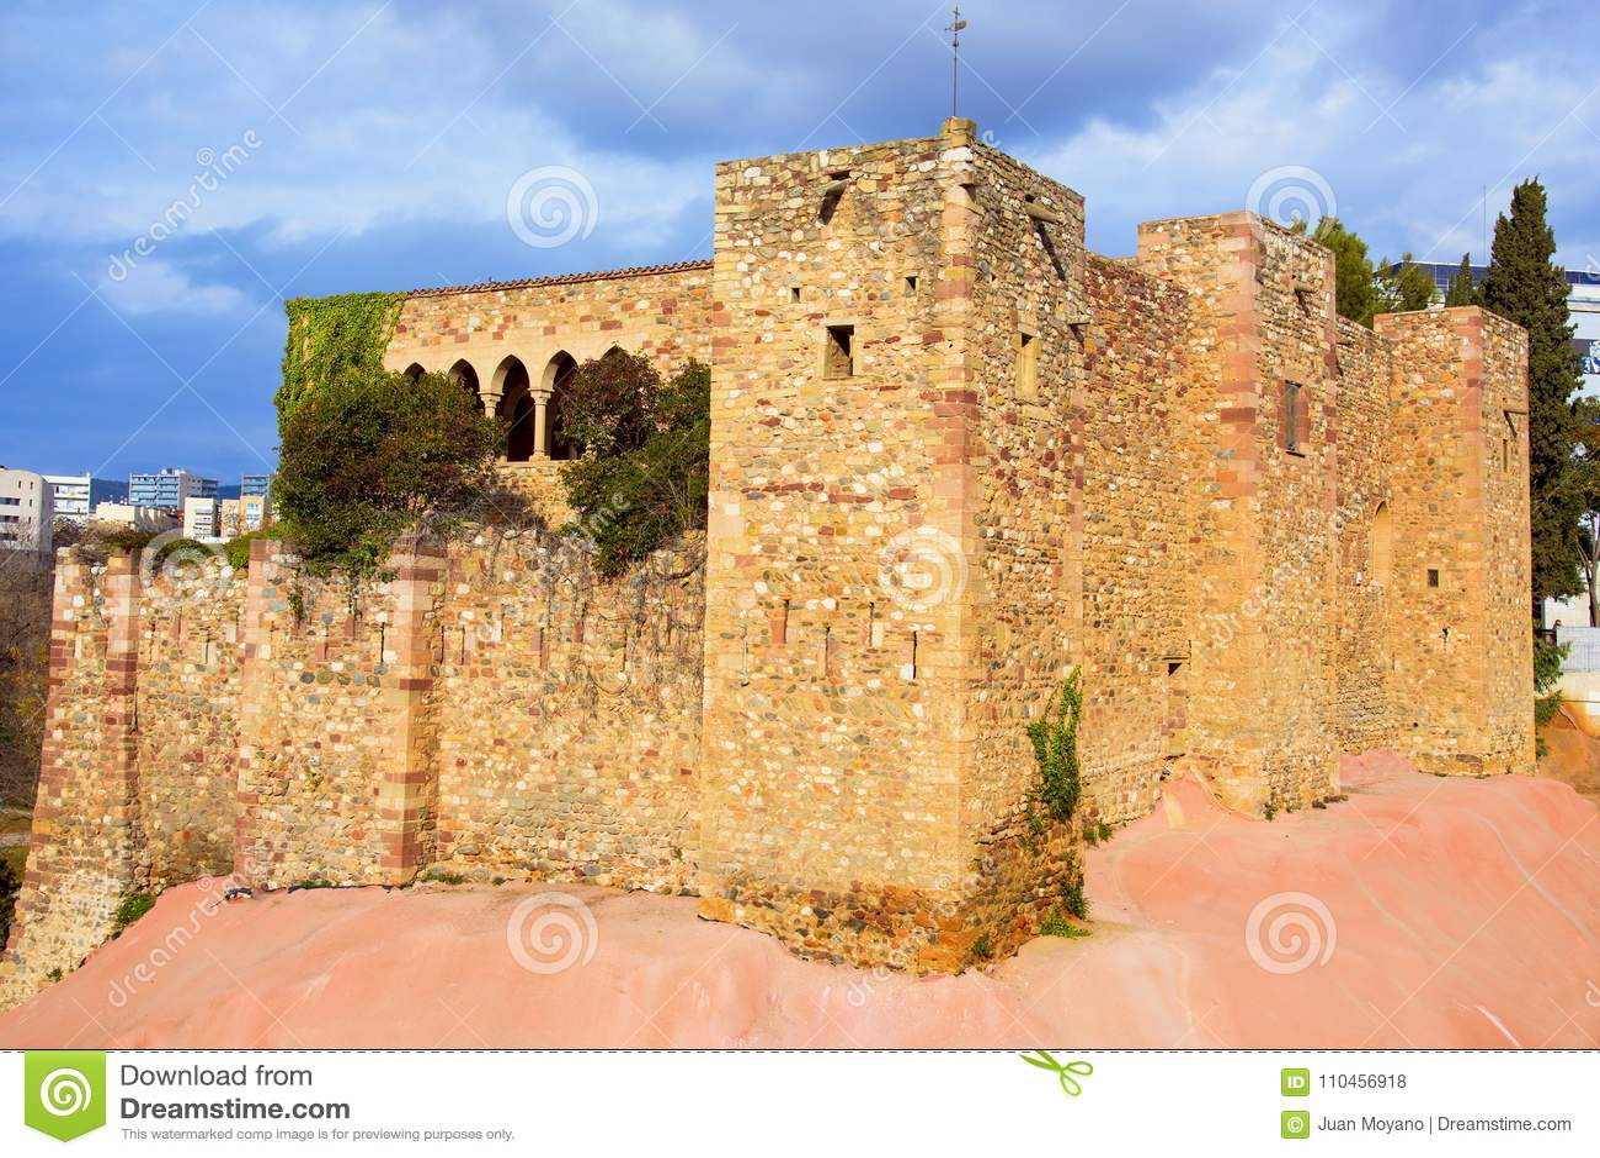 Vallparadis slott i Terrassa, Spanien